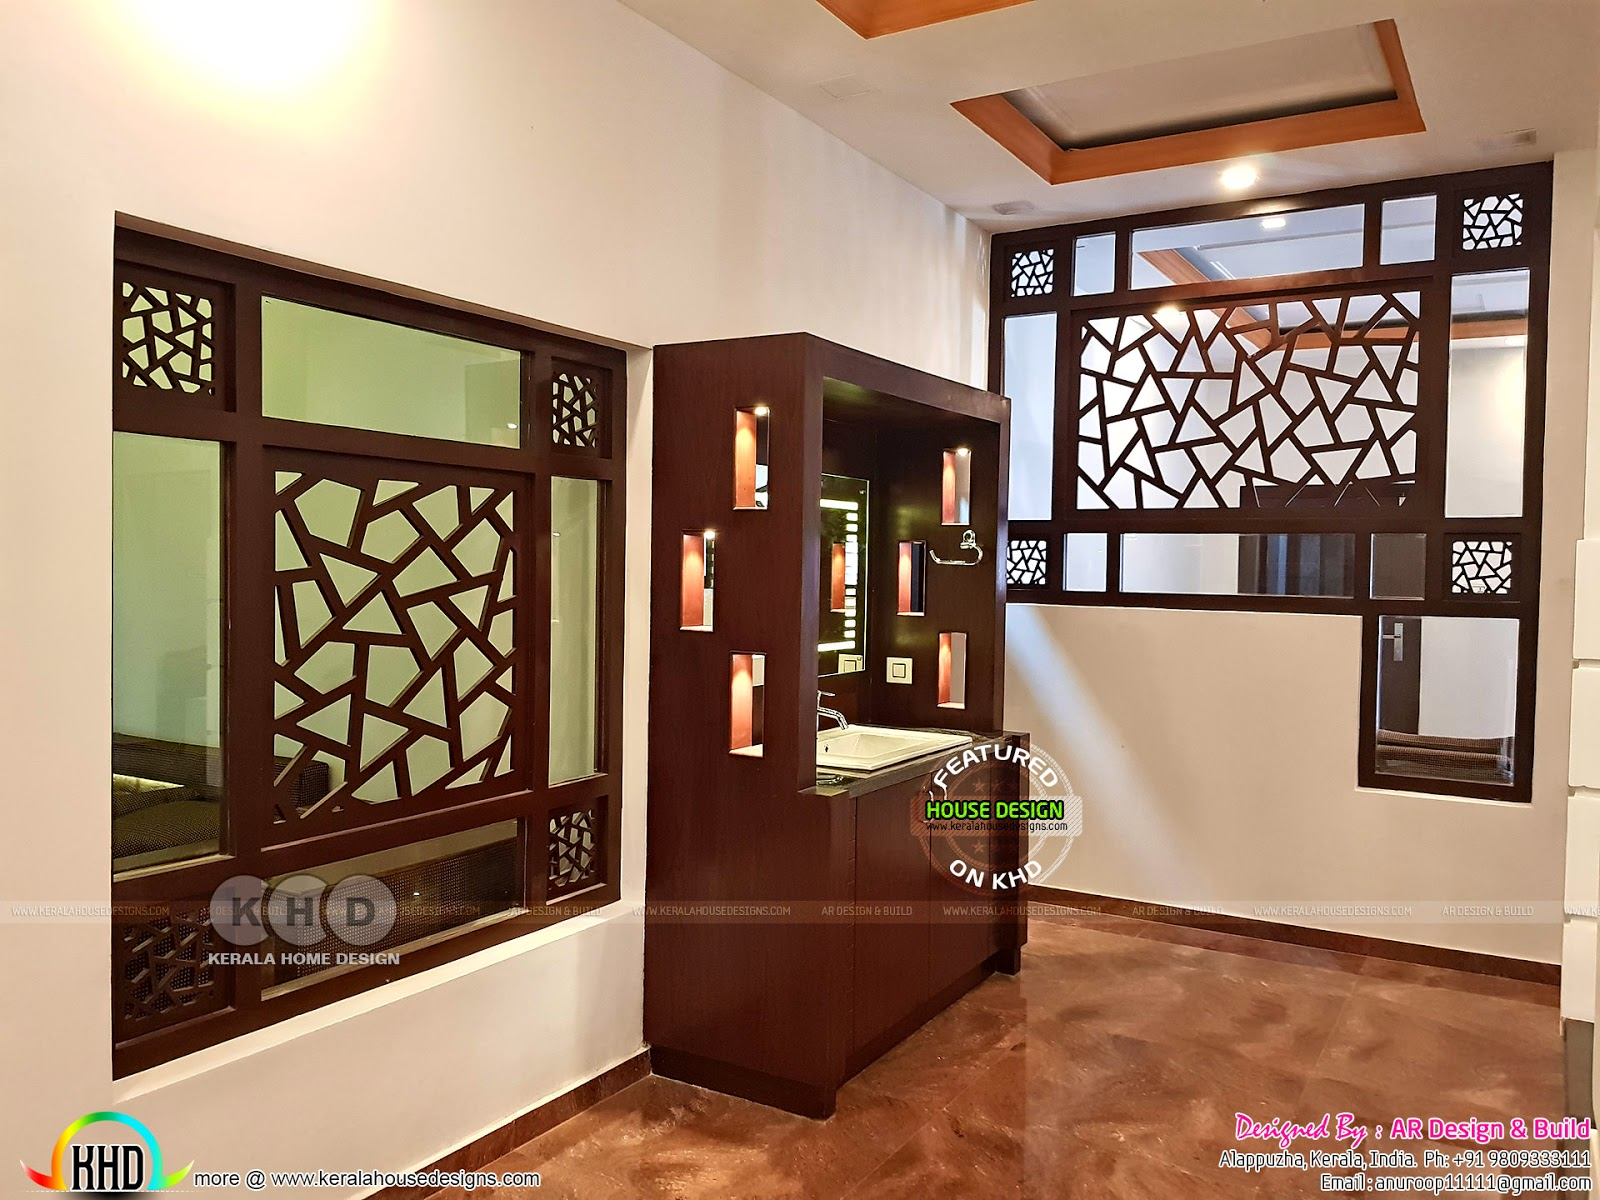 Furnished interior designs in Kerala - Kerala home design ...